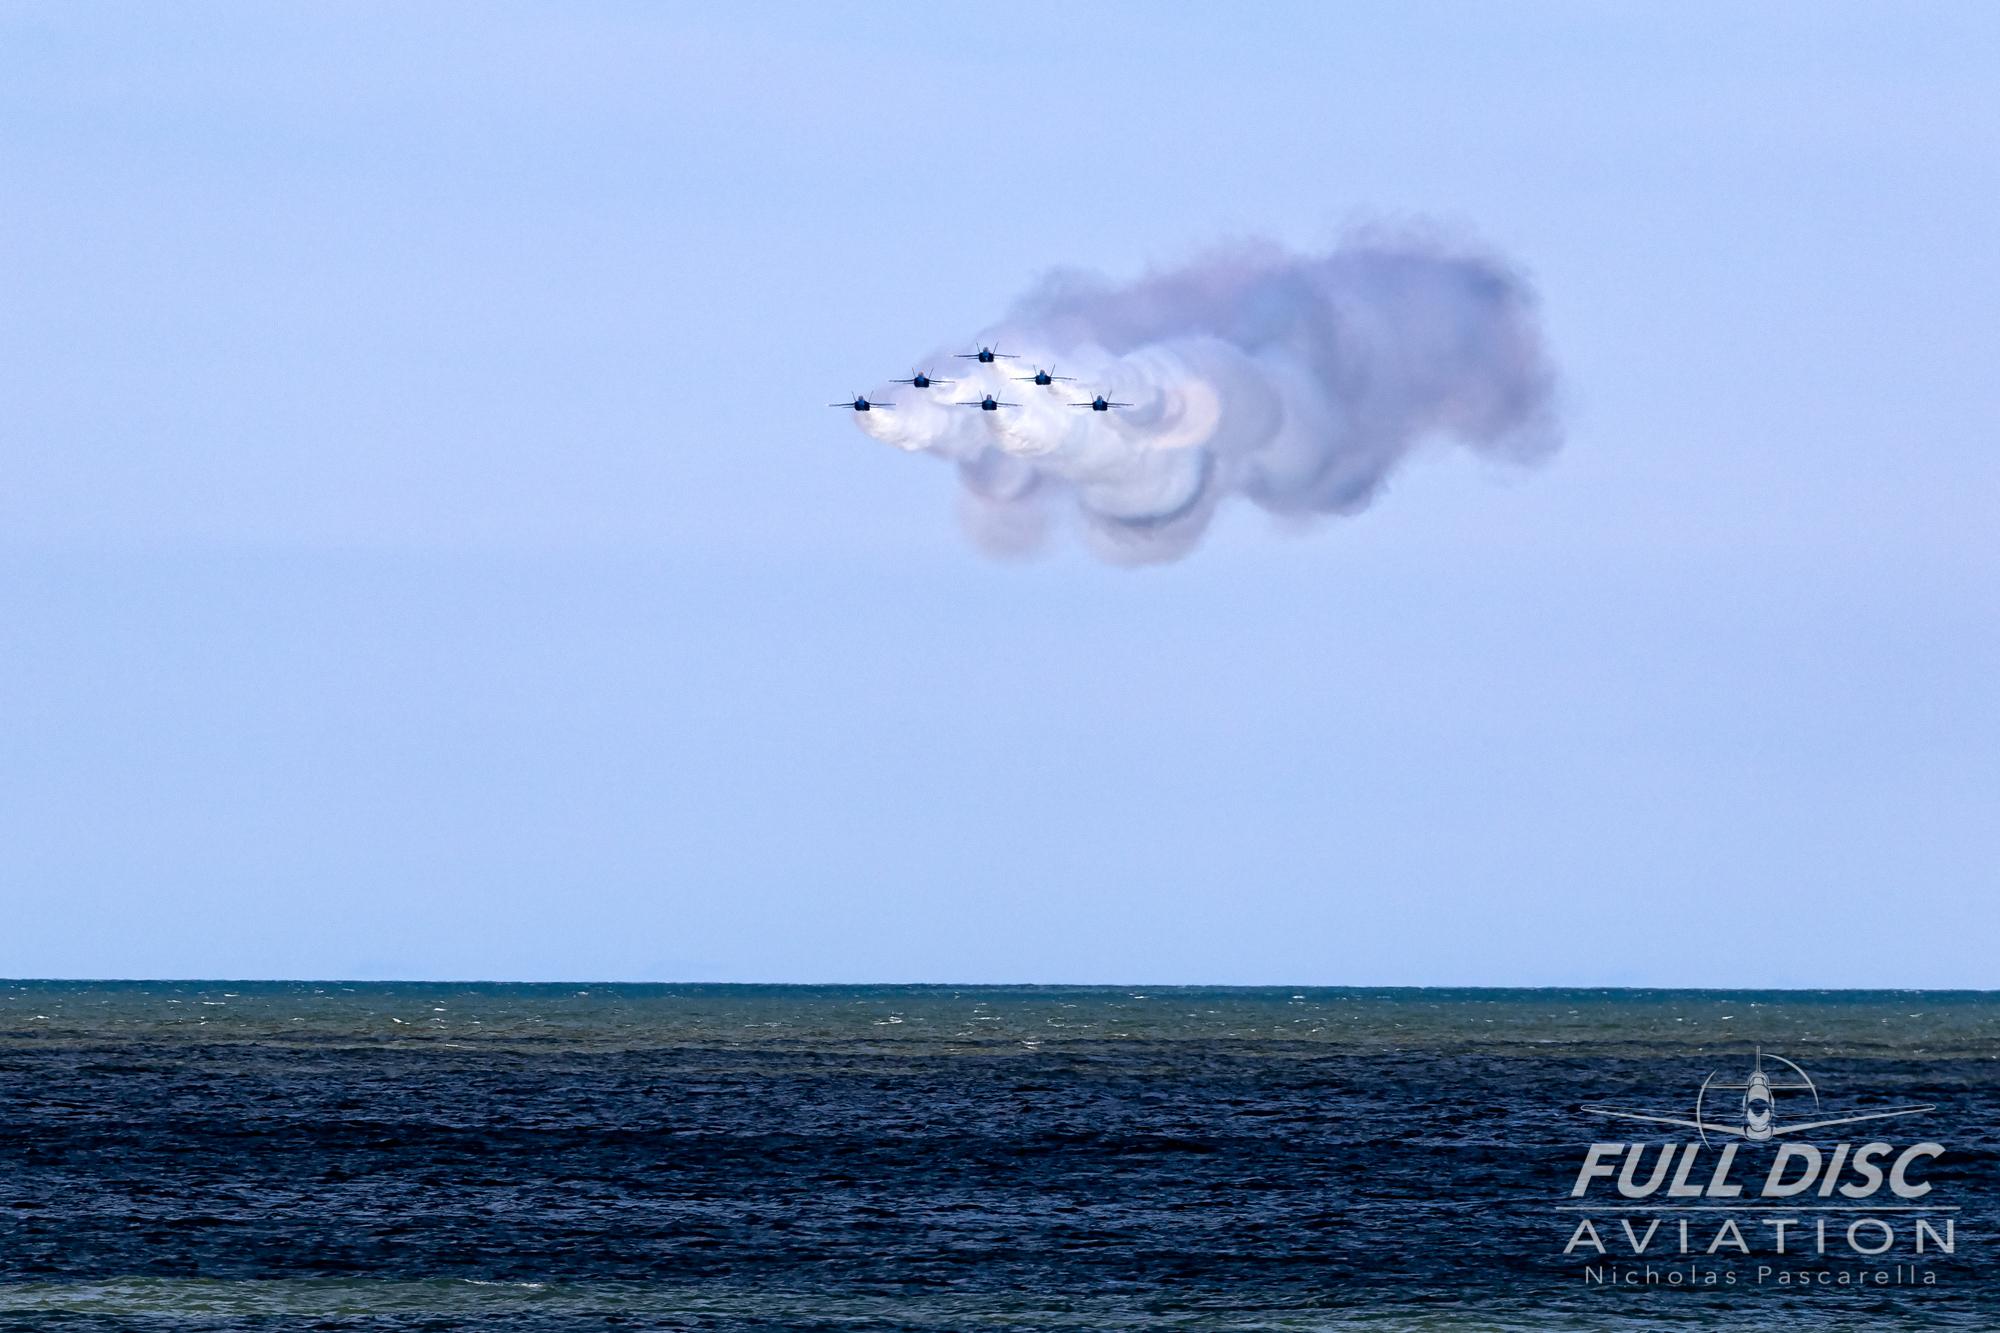 nickpascarella_fulldiscaviation_oceancityairshow_aviation_blueangels_runin.jpg